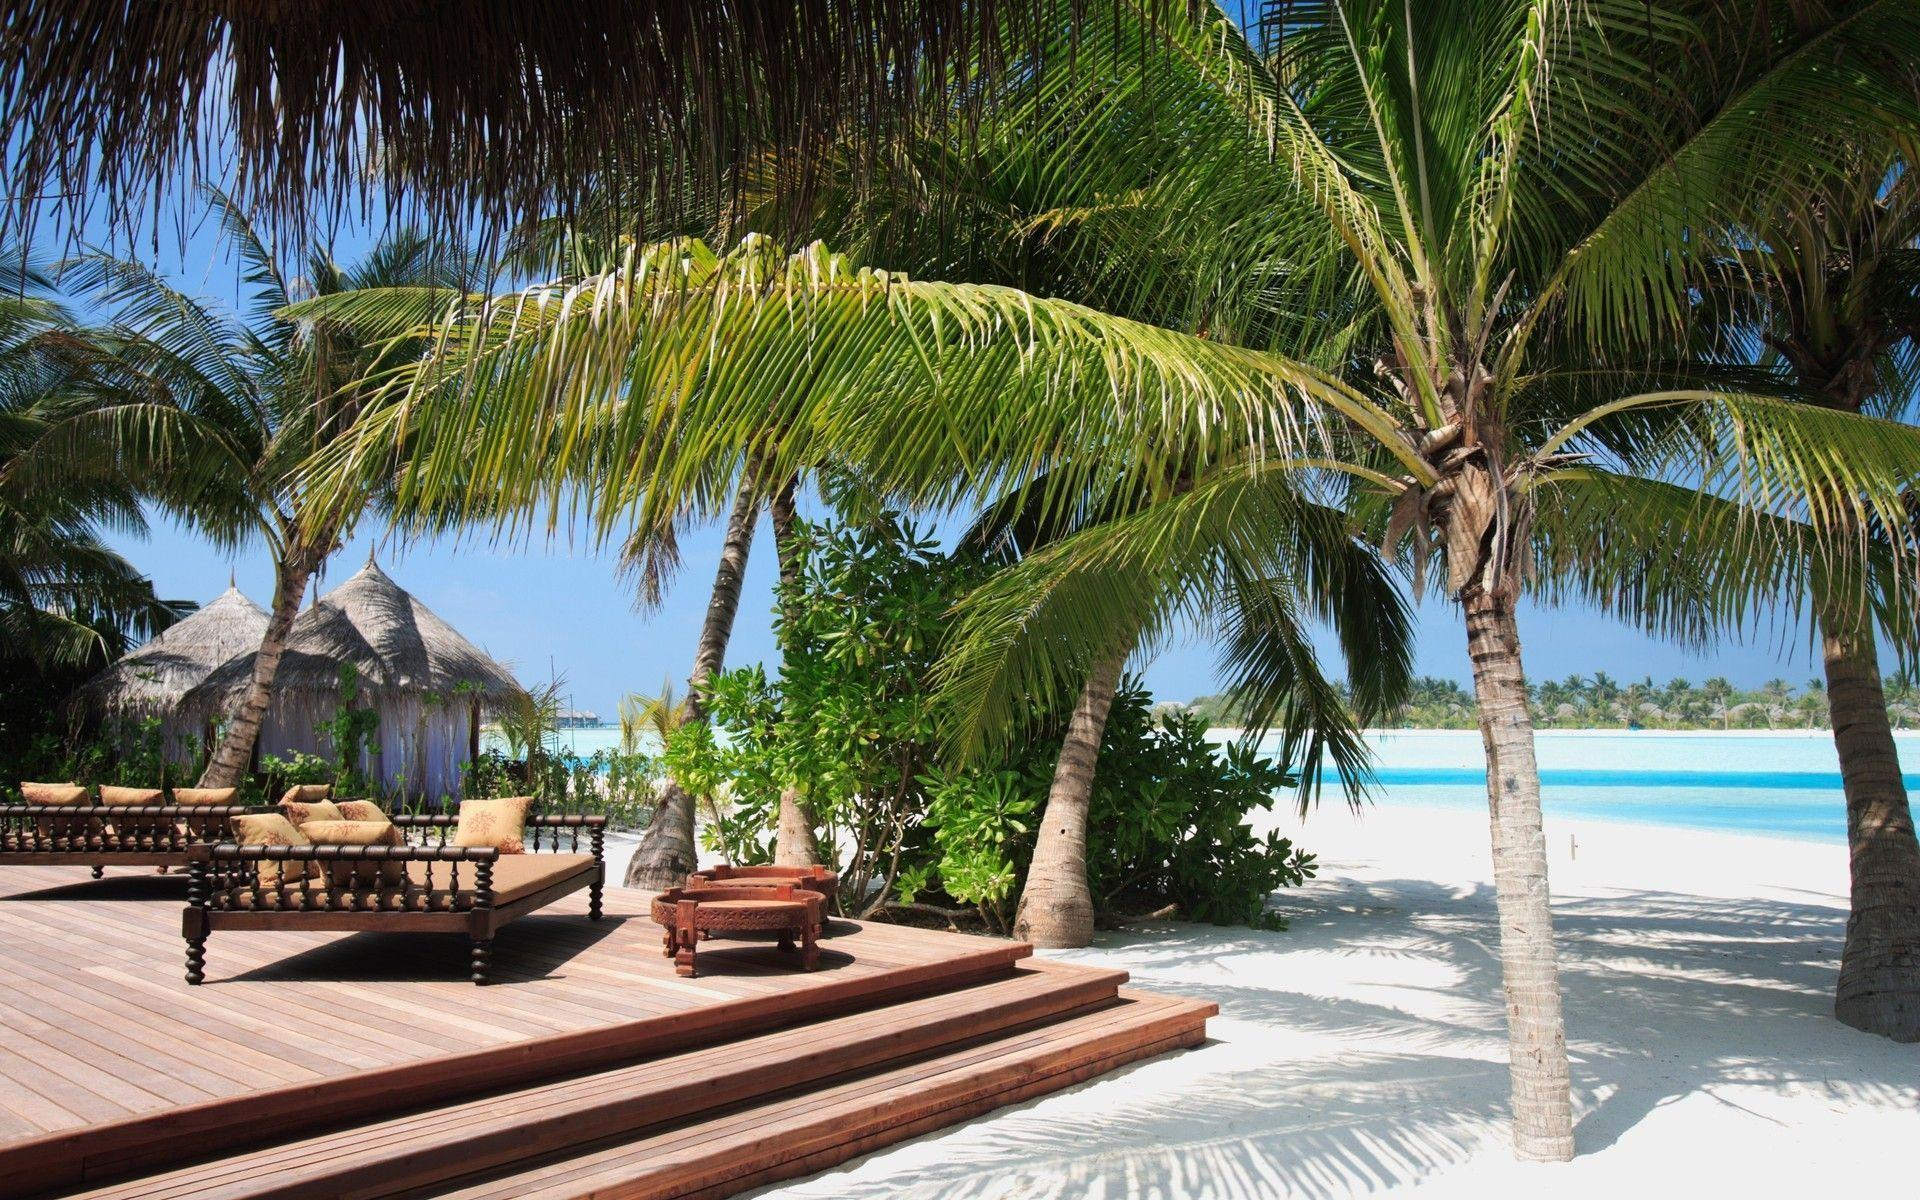 Hd Tropical Island Beach Paradise Wallpapers And Backgrounds: Wallpapers Tropical Beach